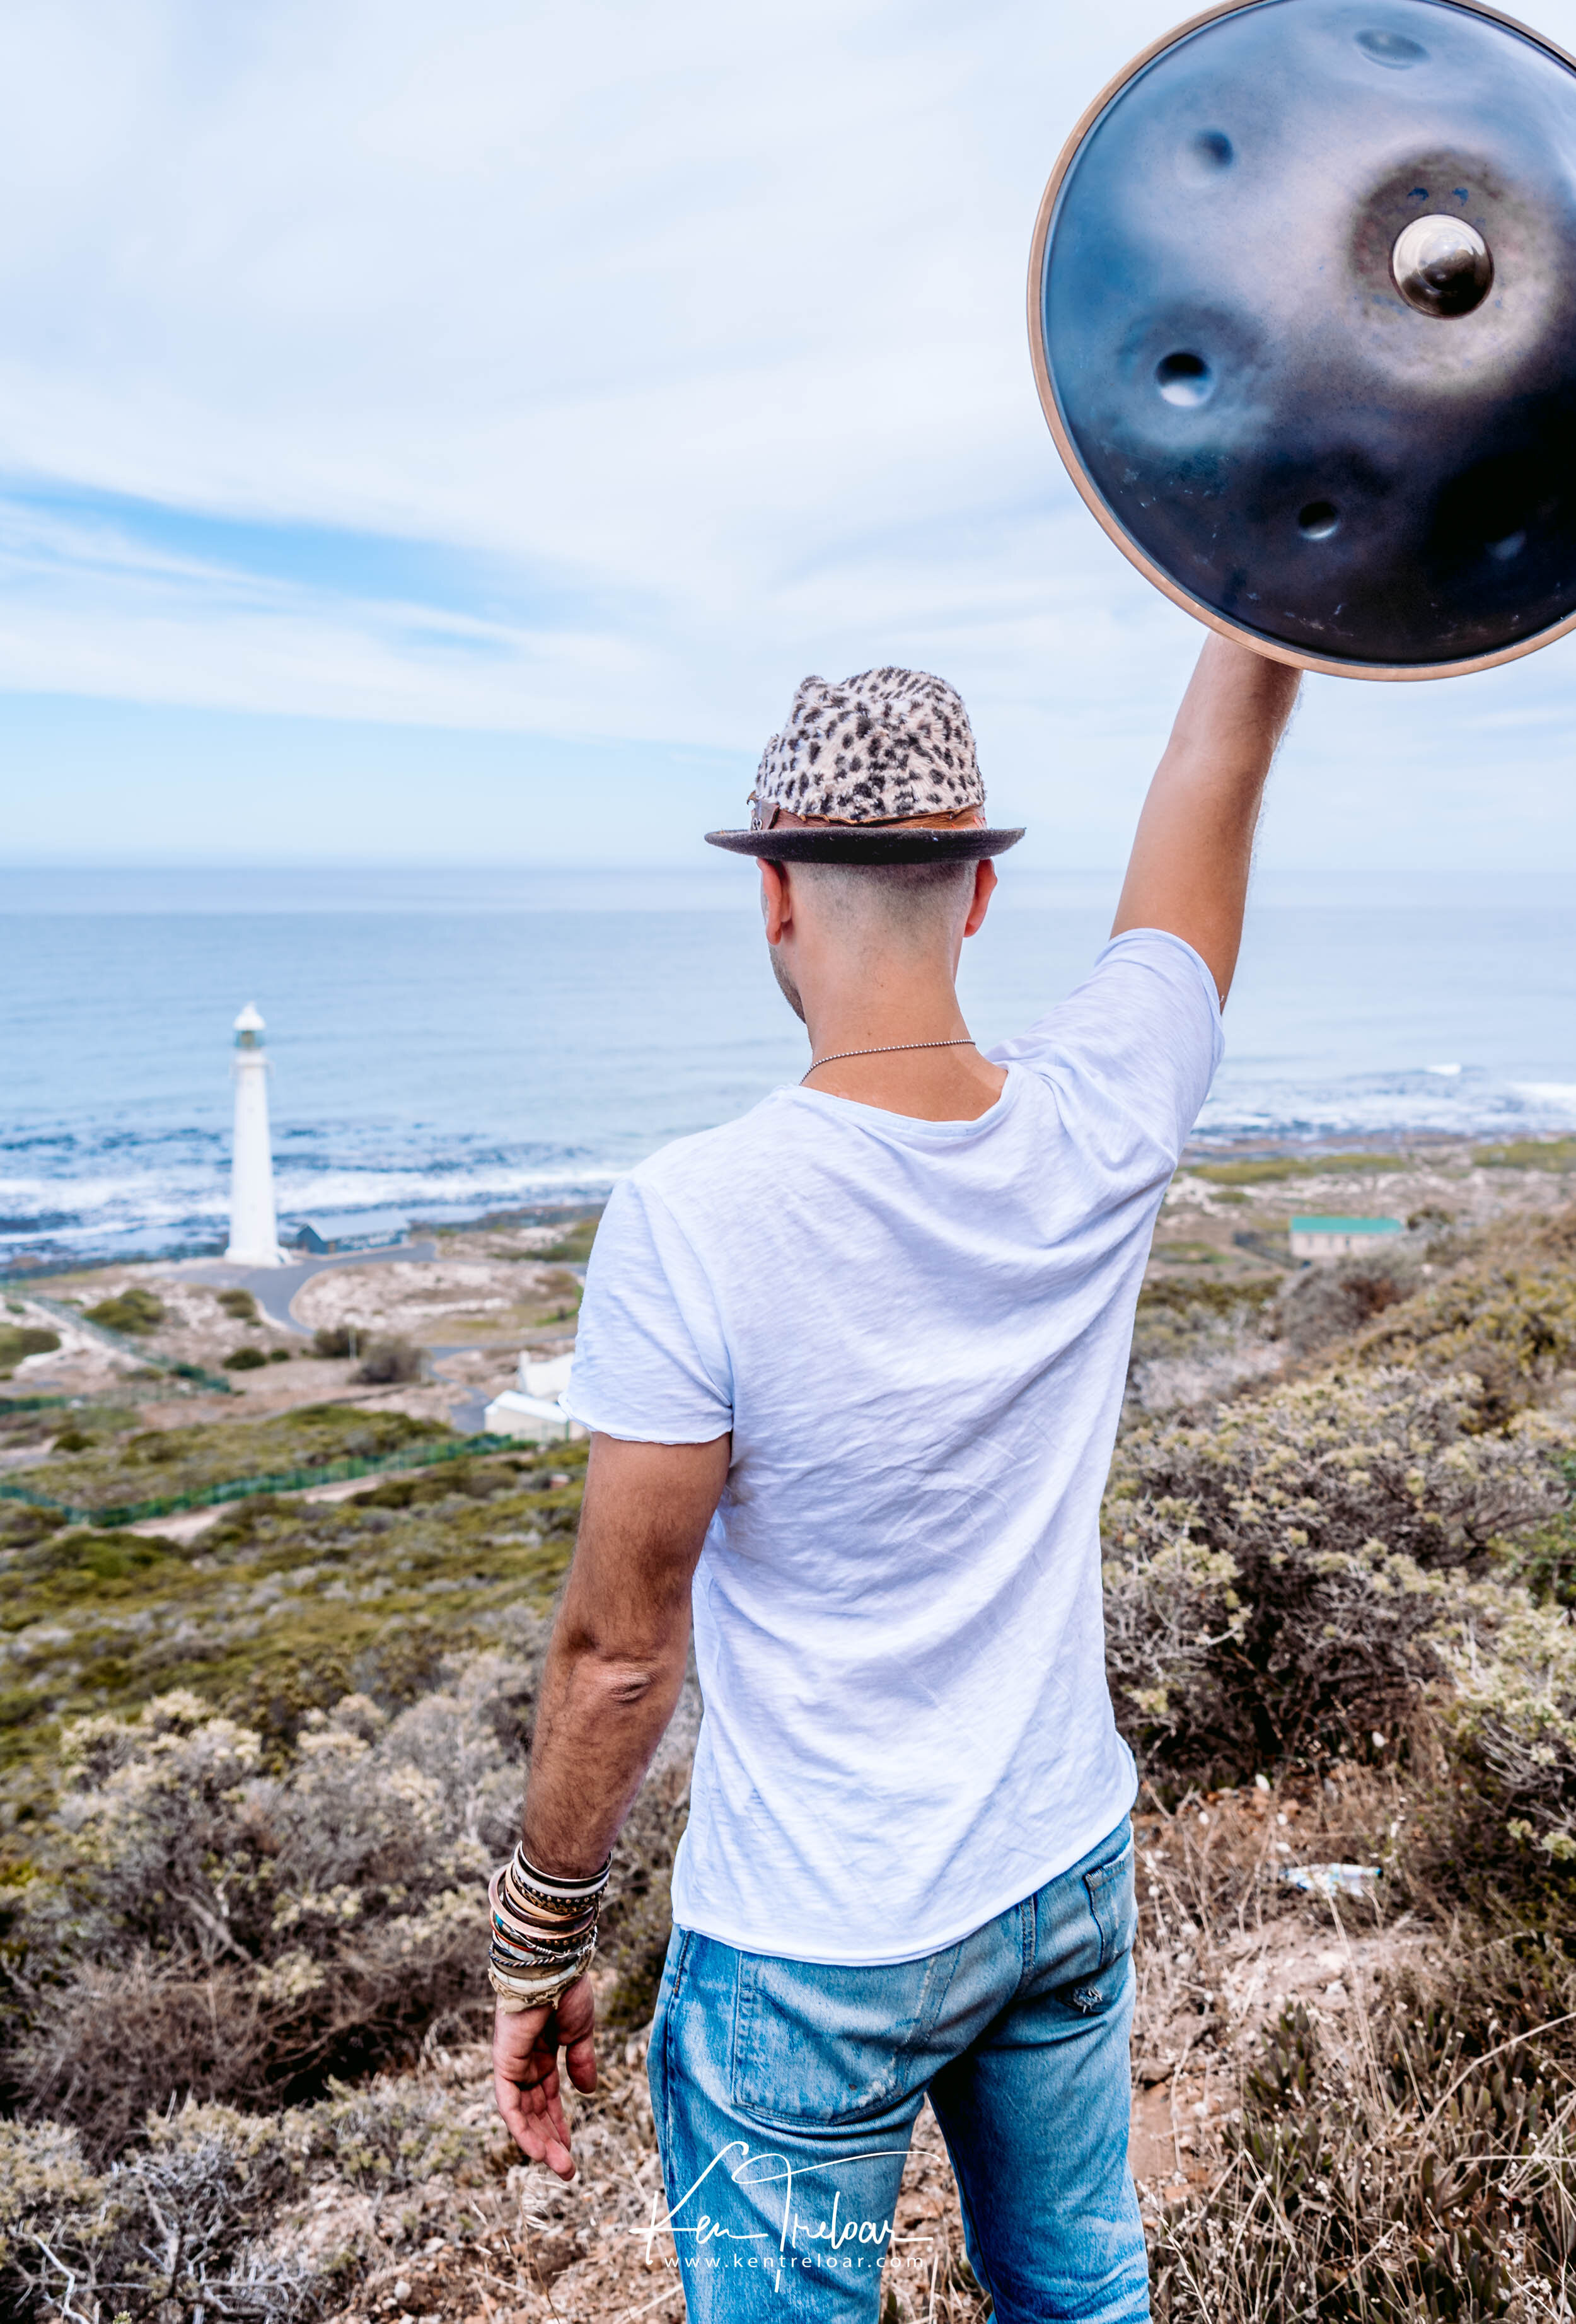 Marci Selvaggio - Hang Instrument Cape Town Tour - South Africa - Kommetjie Slankop Lighthouse -  Image by Ken Treloar.jpg